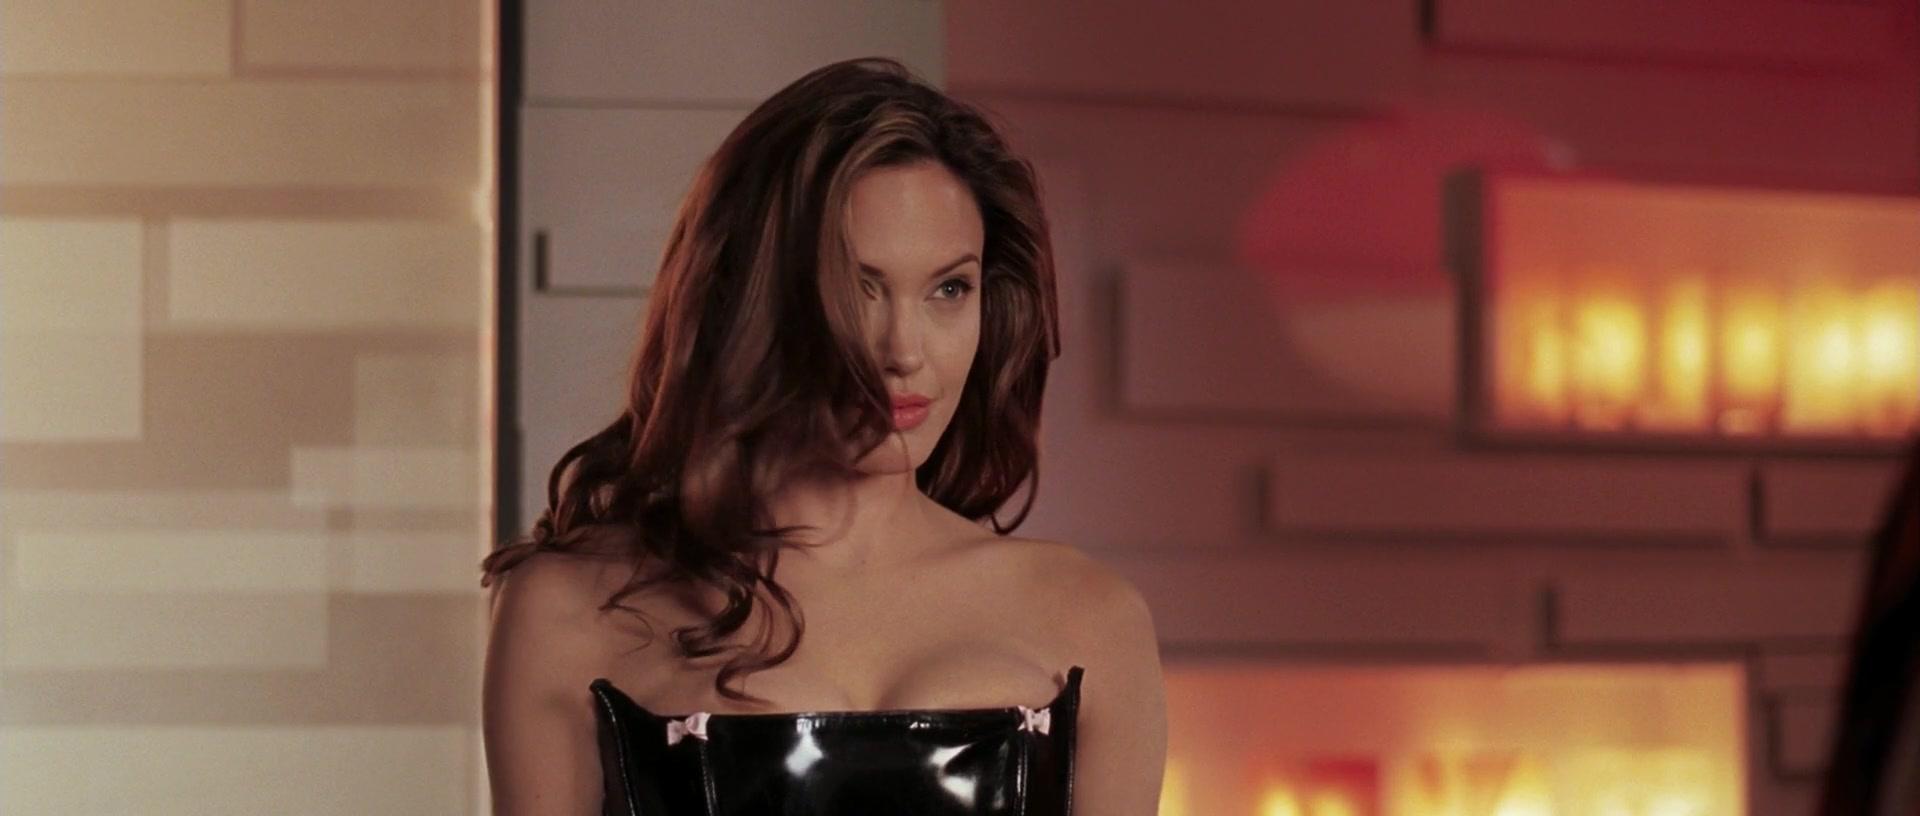 Eva Angelina Behind The Scenes